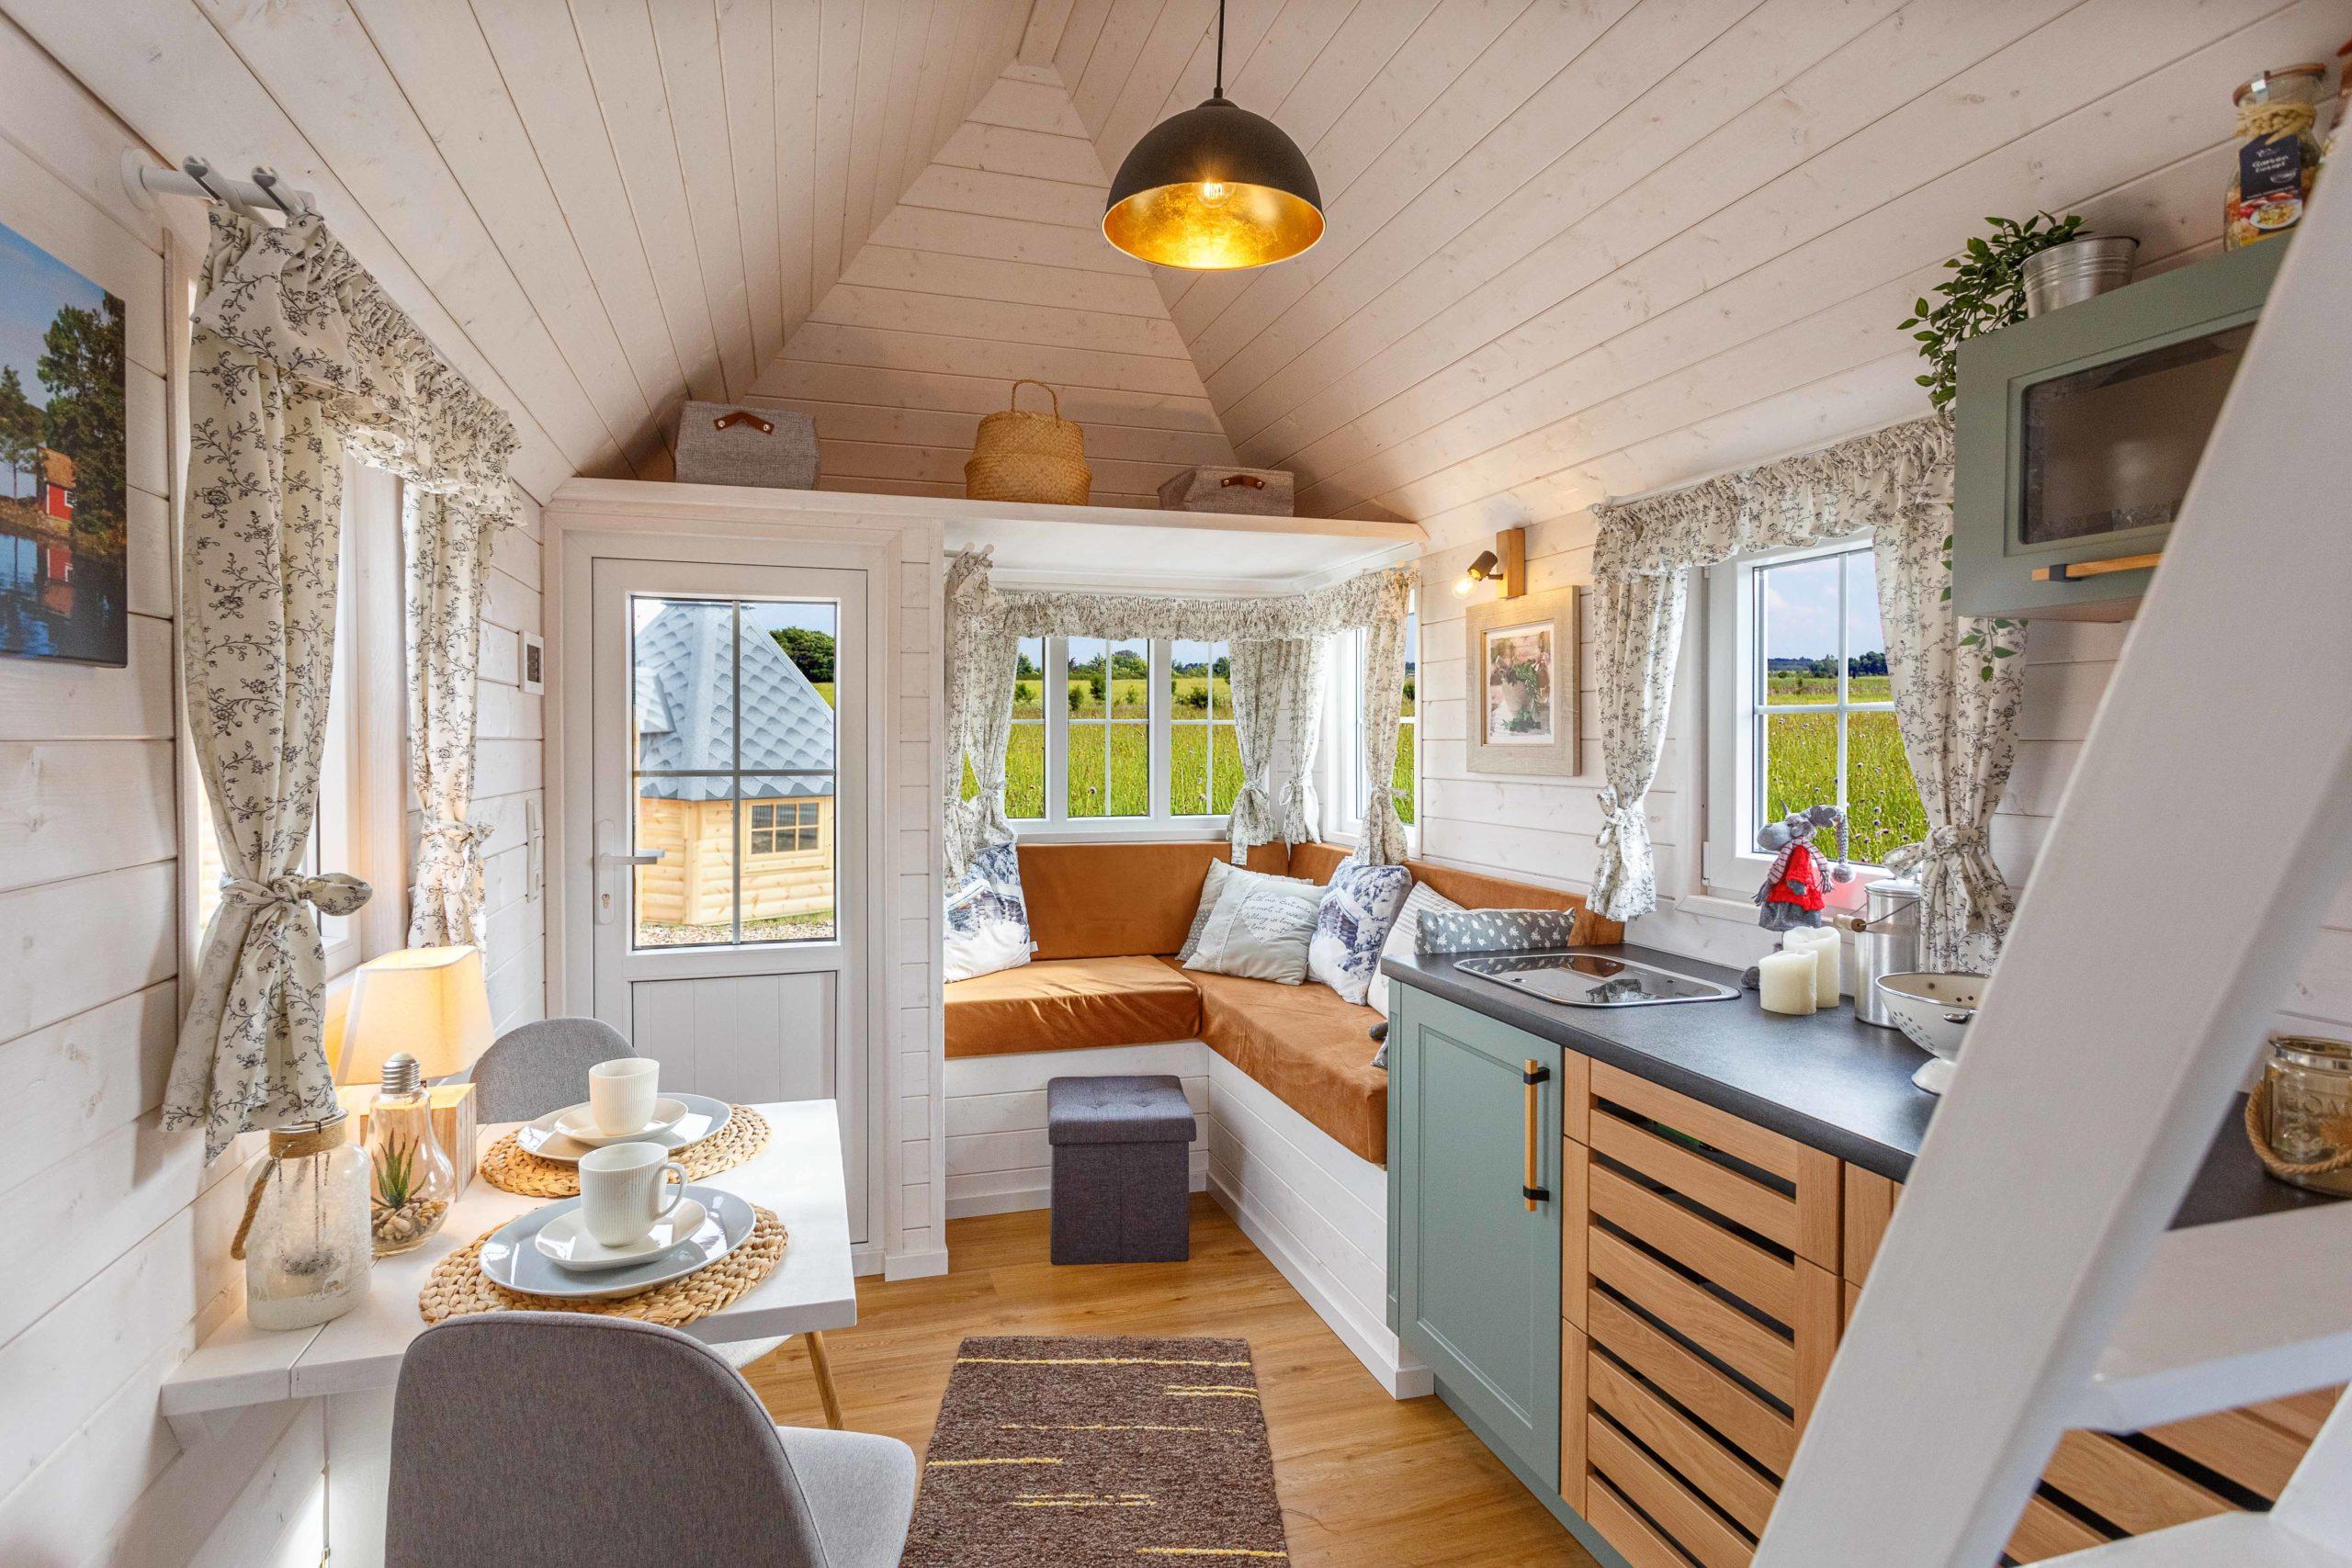 mobiles-tiny-house-schweden-vital-camp-gmbh-12